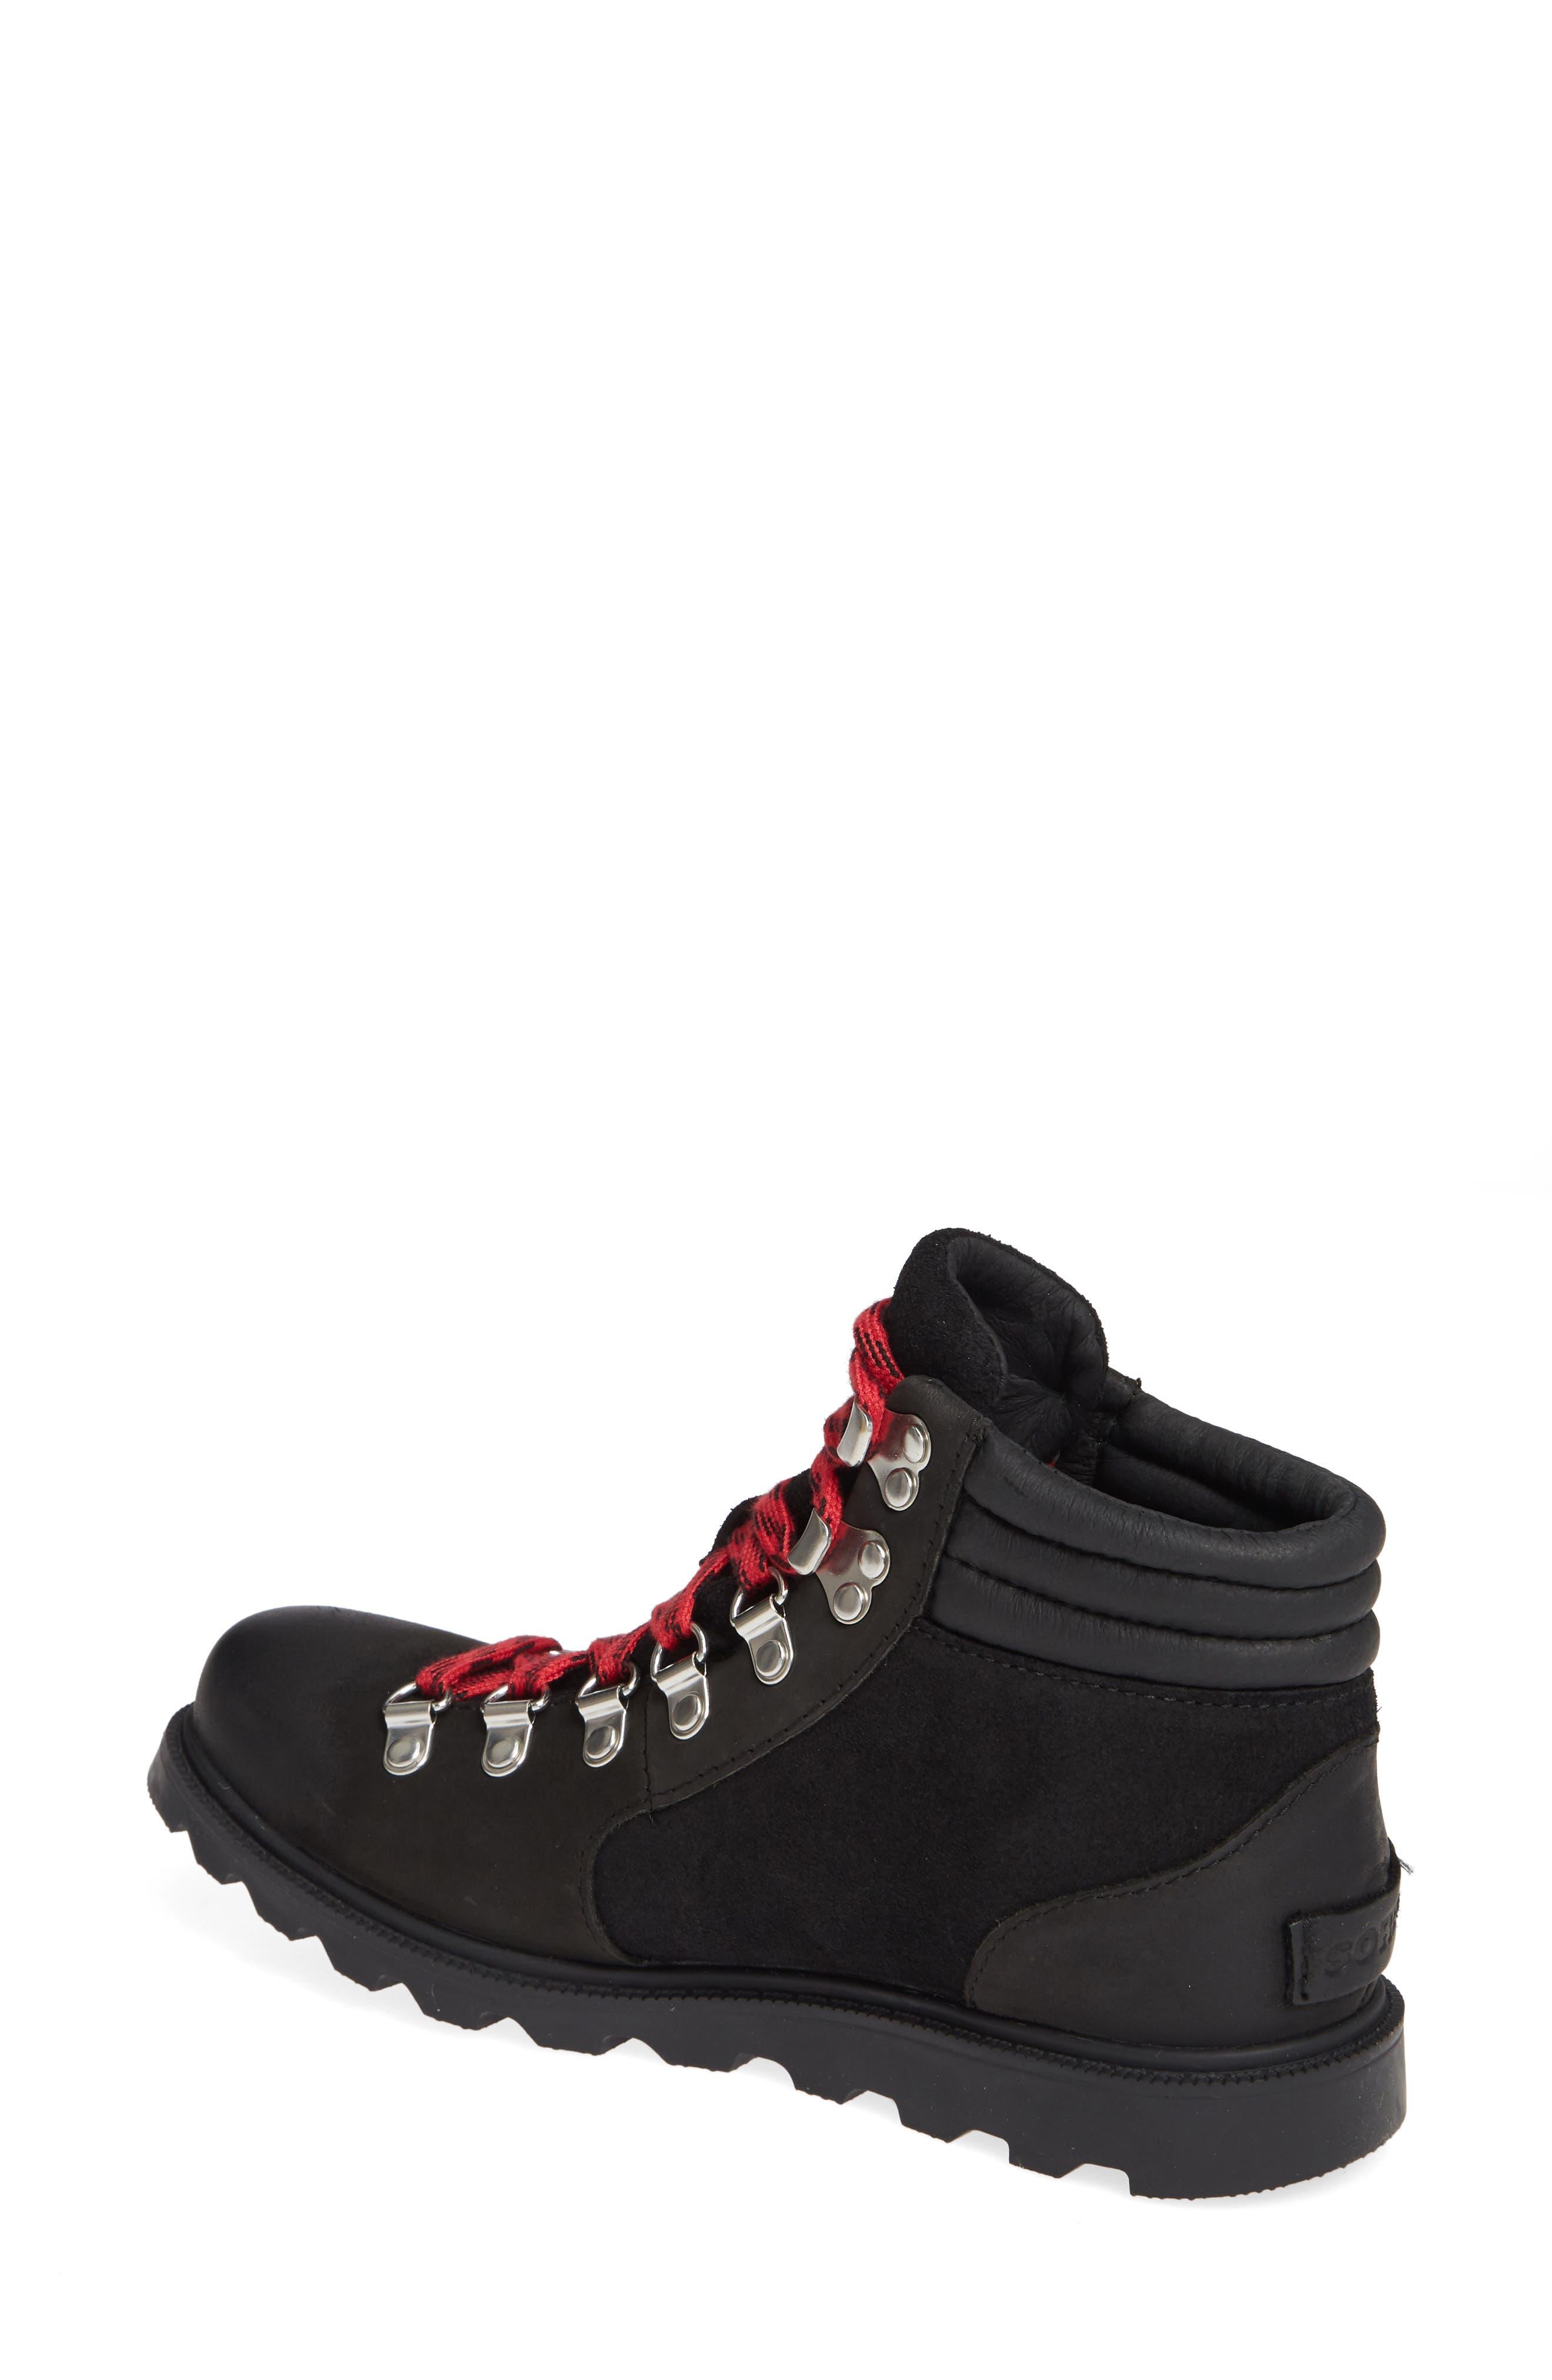 SOREL, Ainsley Conquest Waterproof Boot, Alternate thumbnail 2, color, BLACK/ BLACK